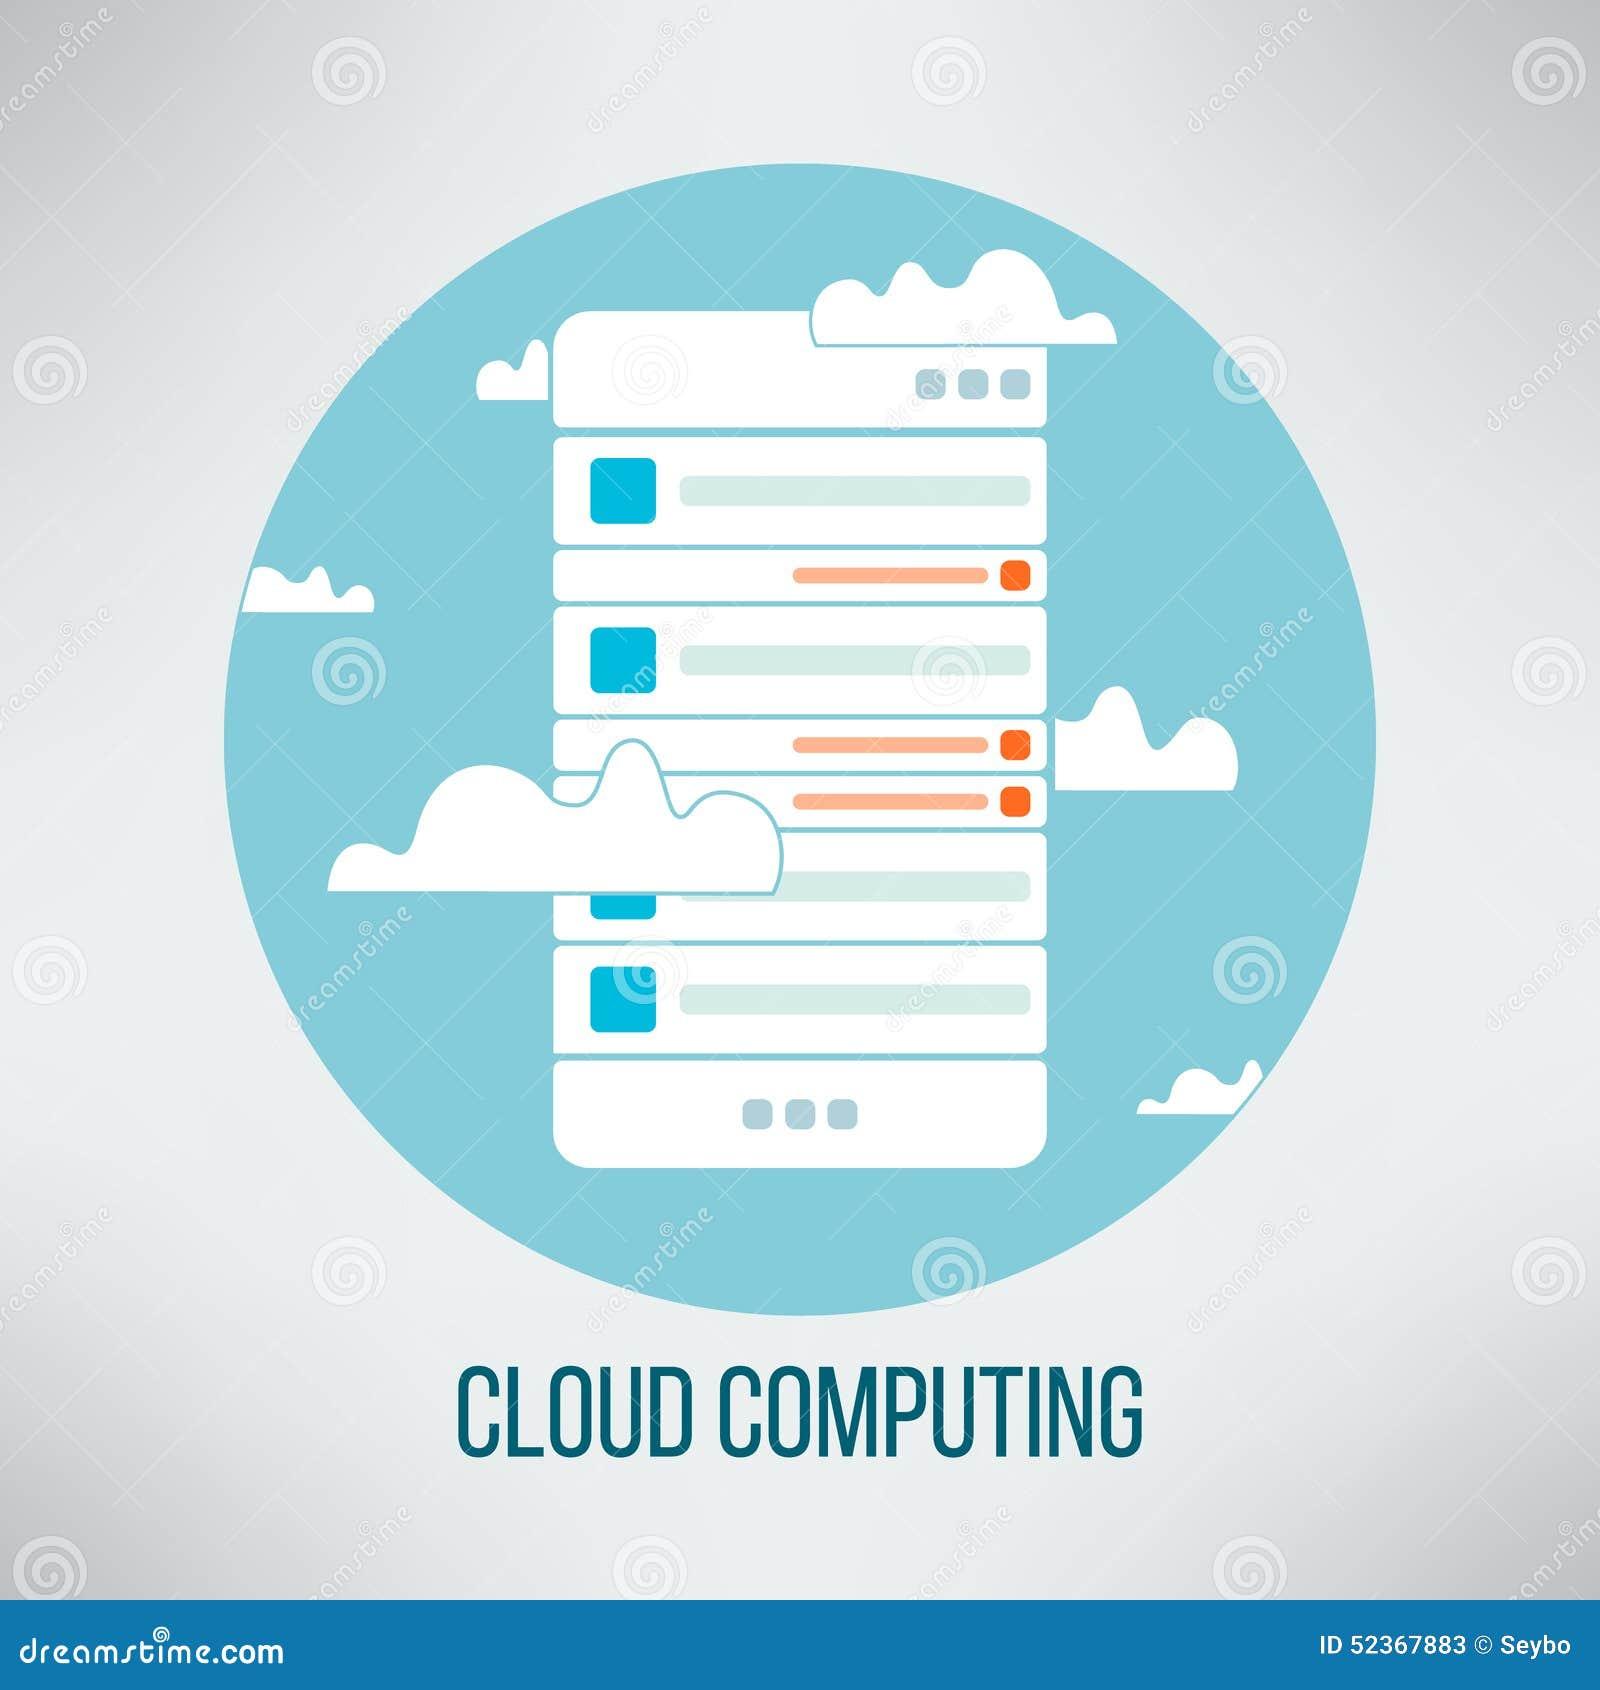 cloud computing business plan template